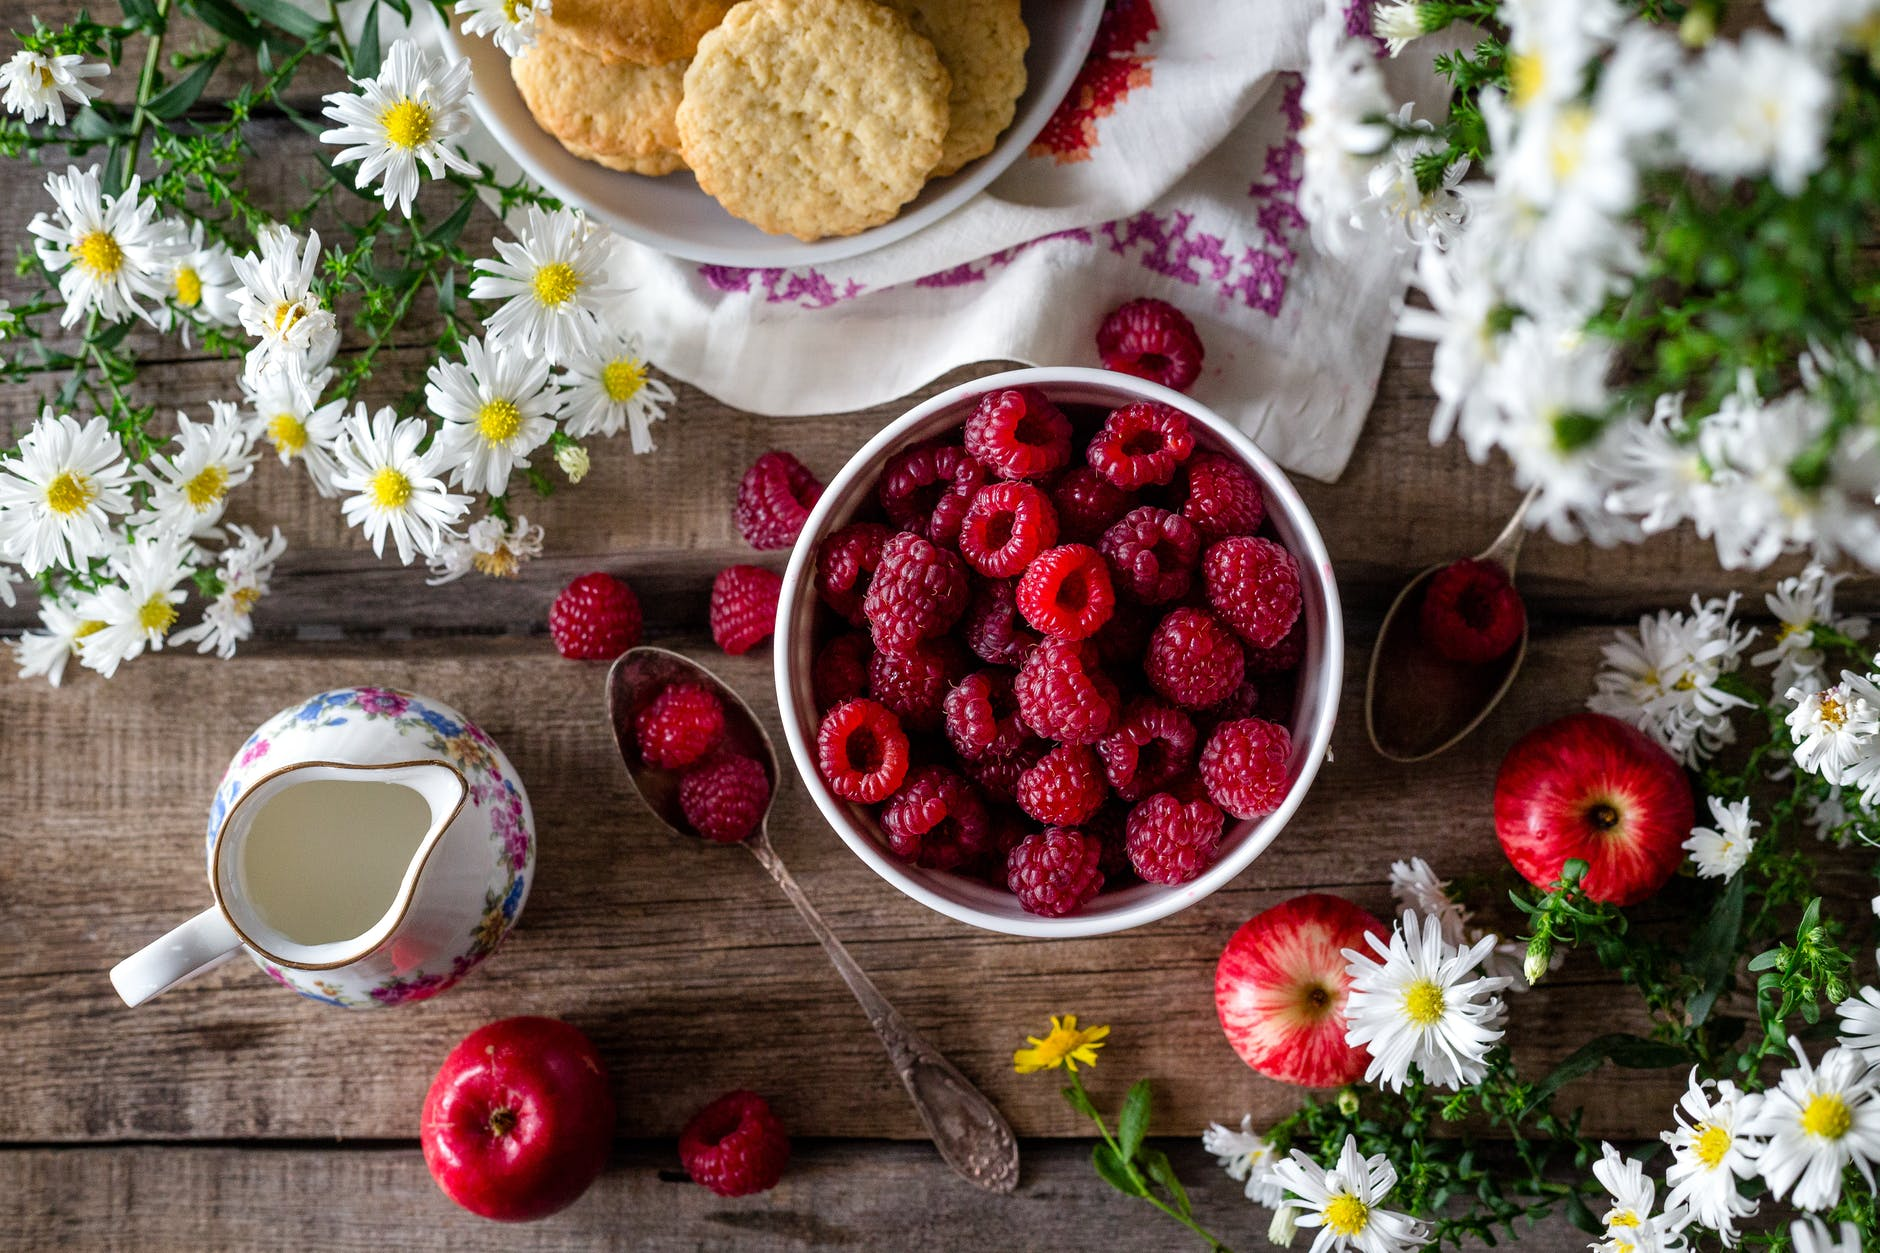 appetizer apples berries berry